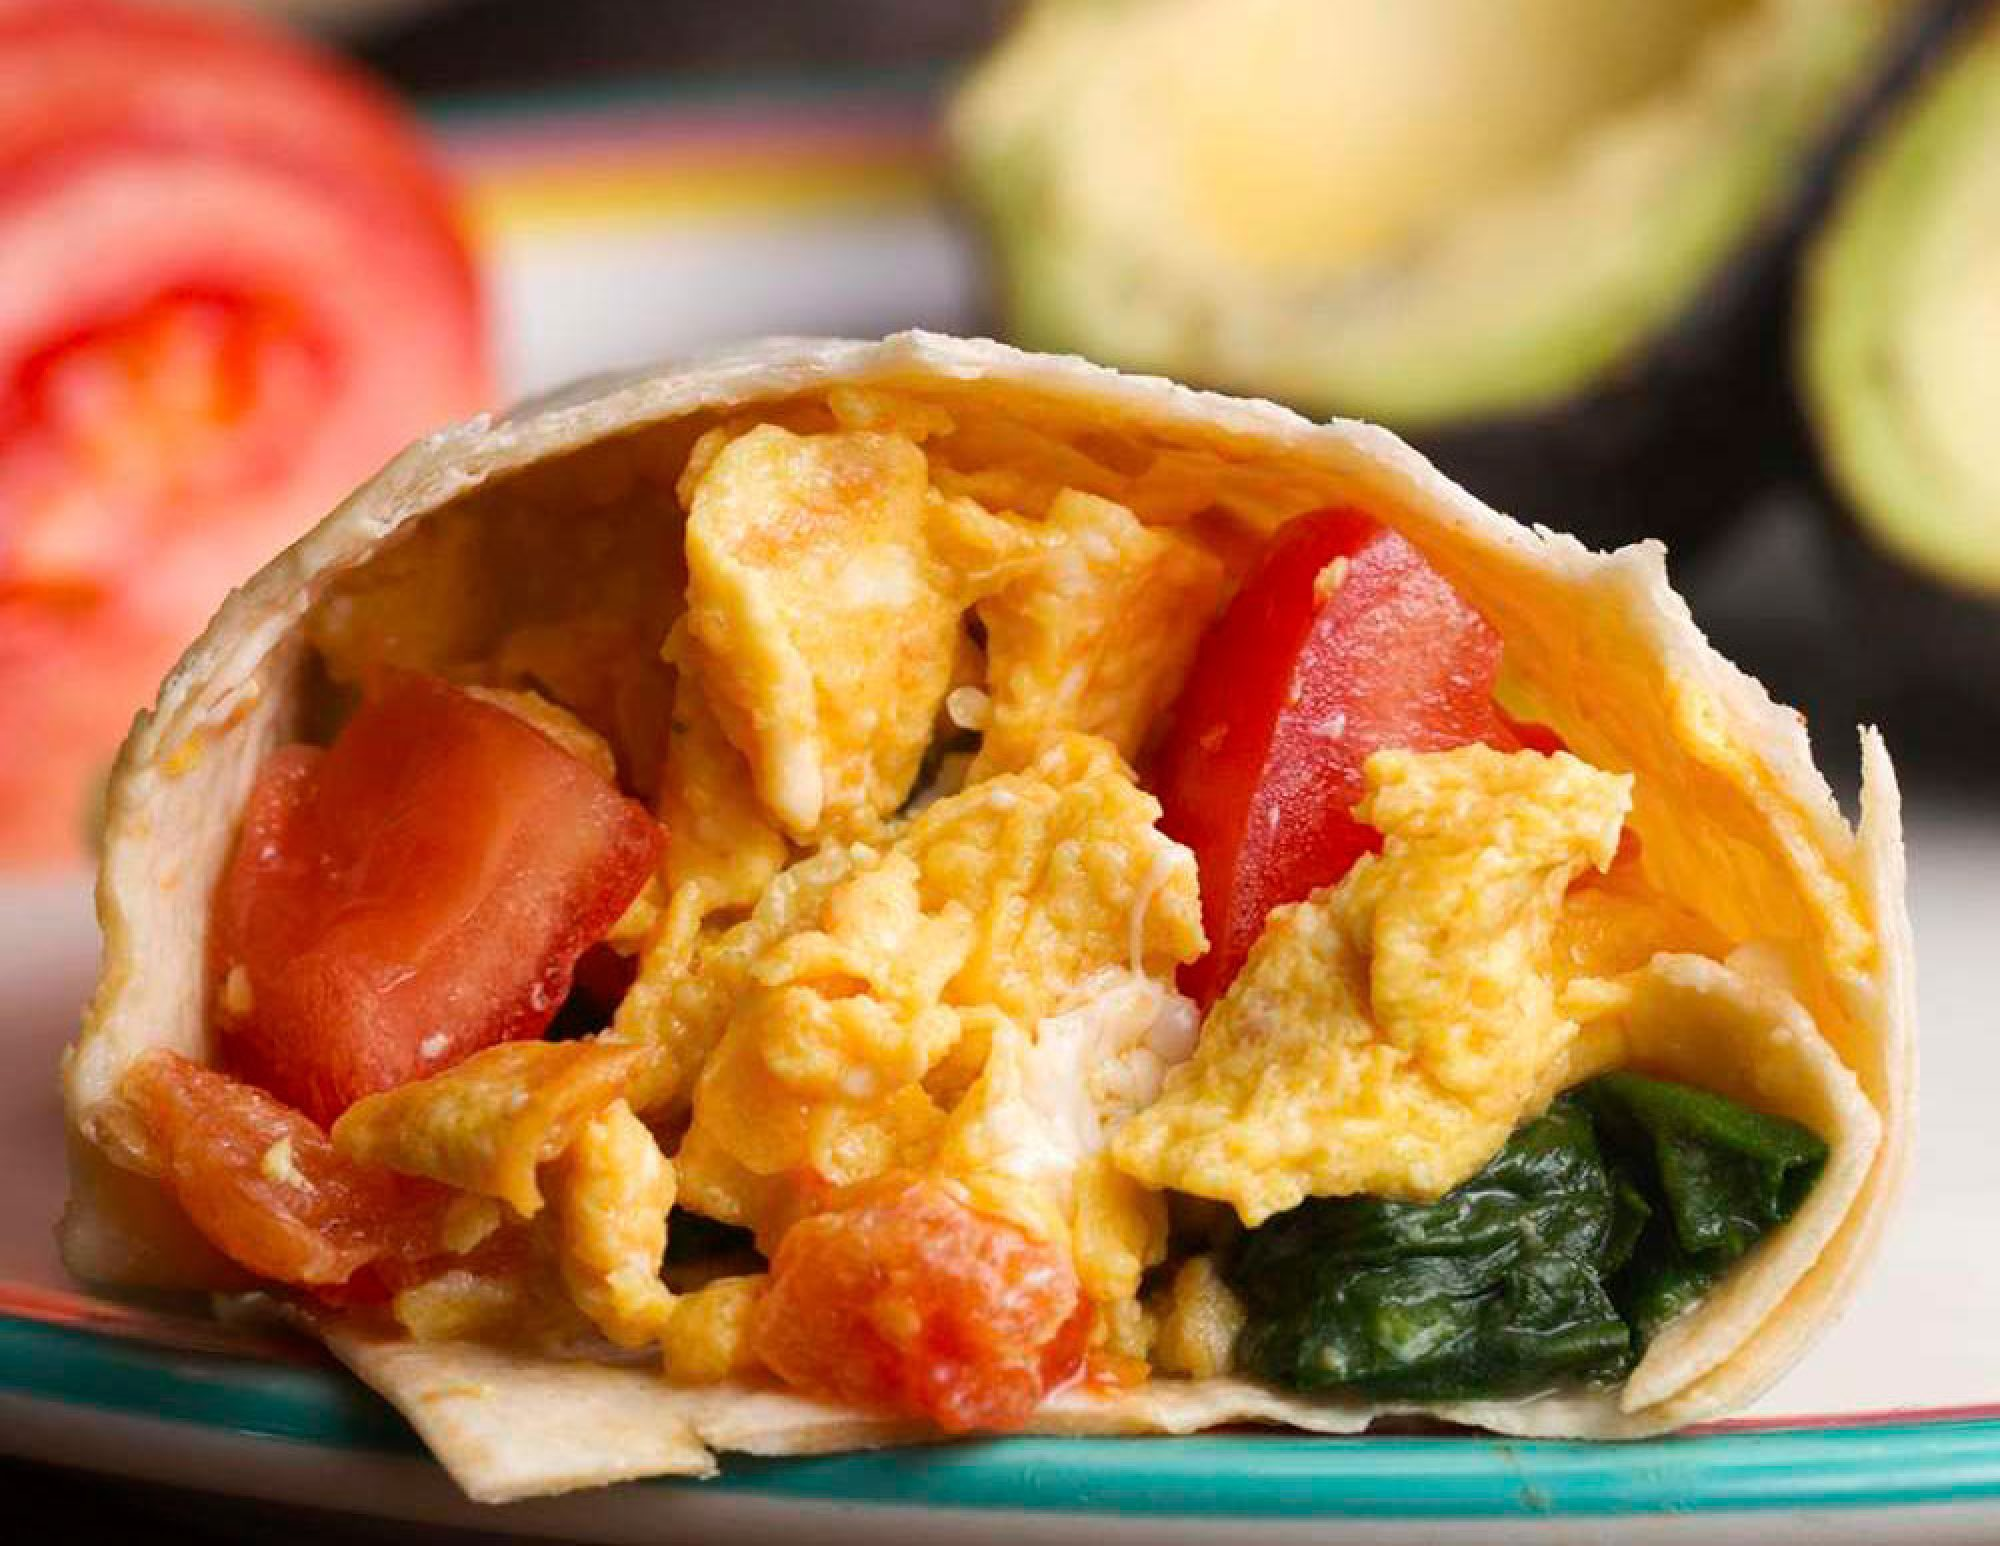 Freezer prep Breakfast Burritos